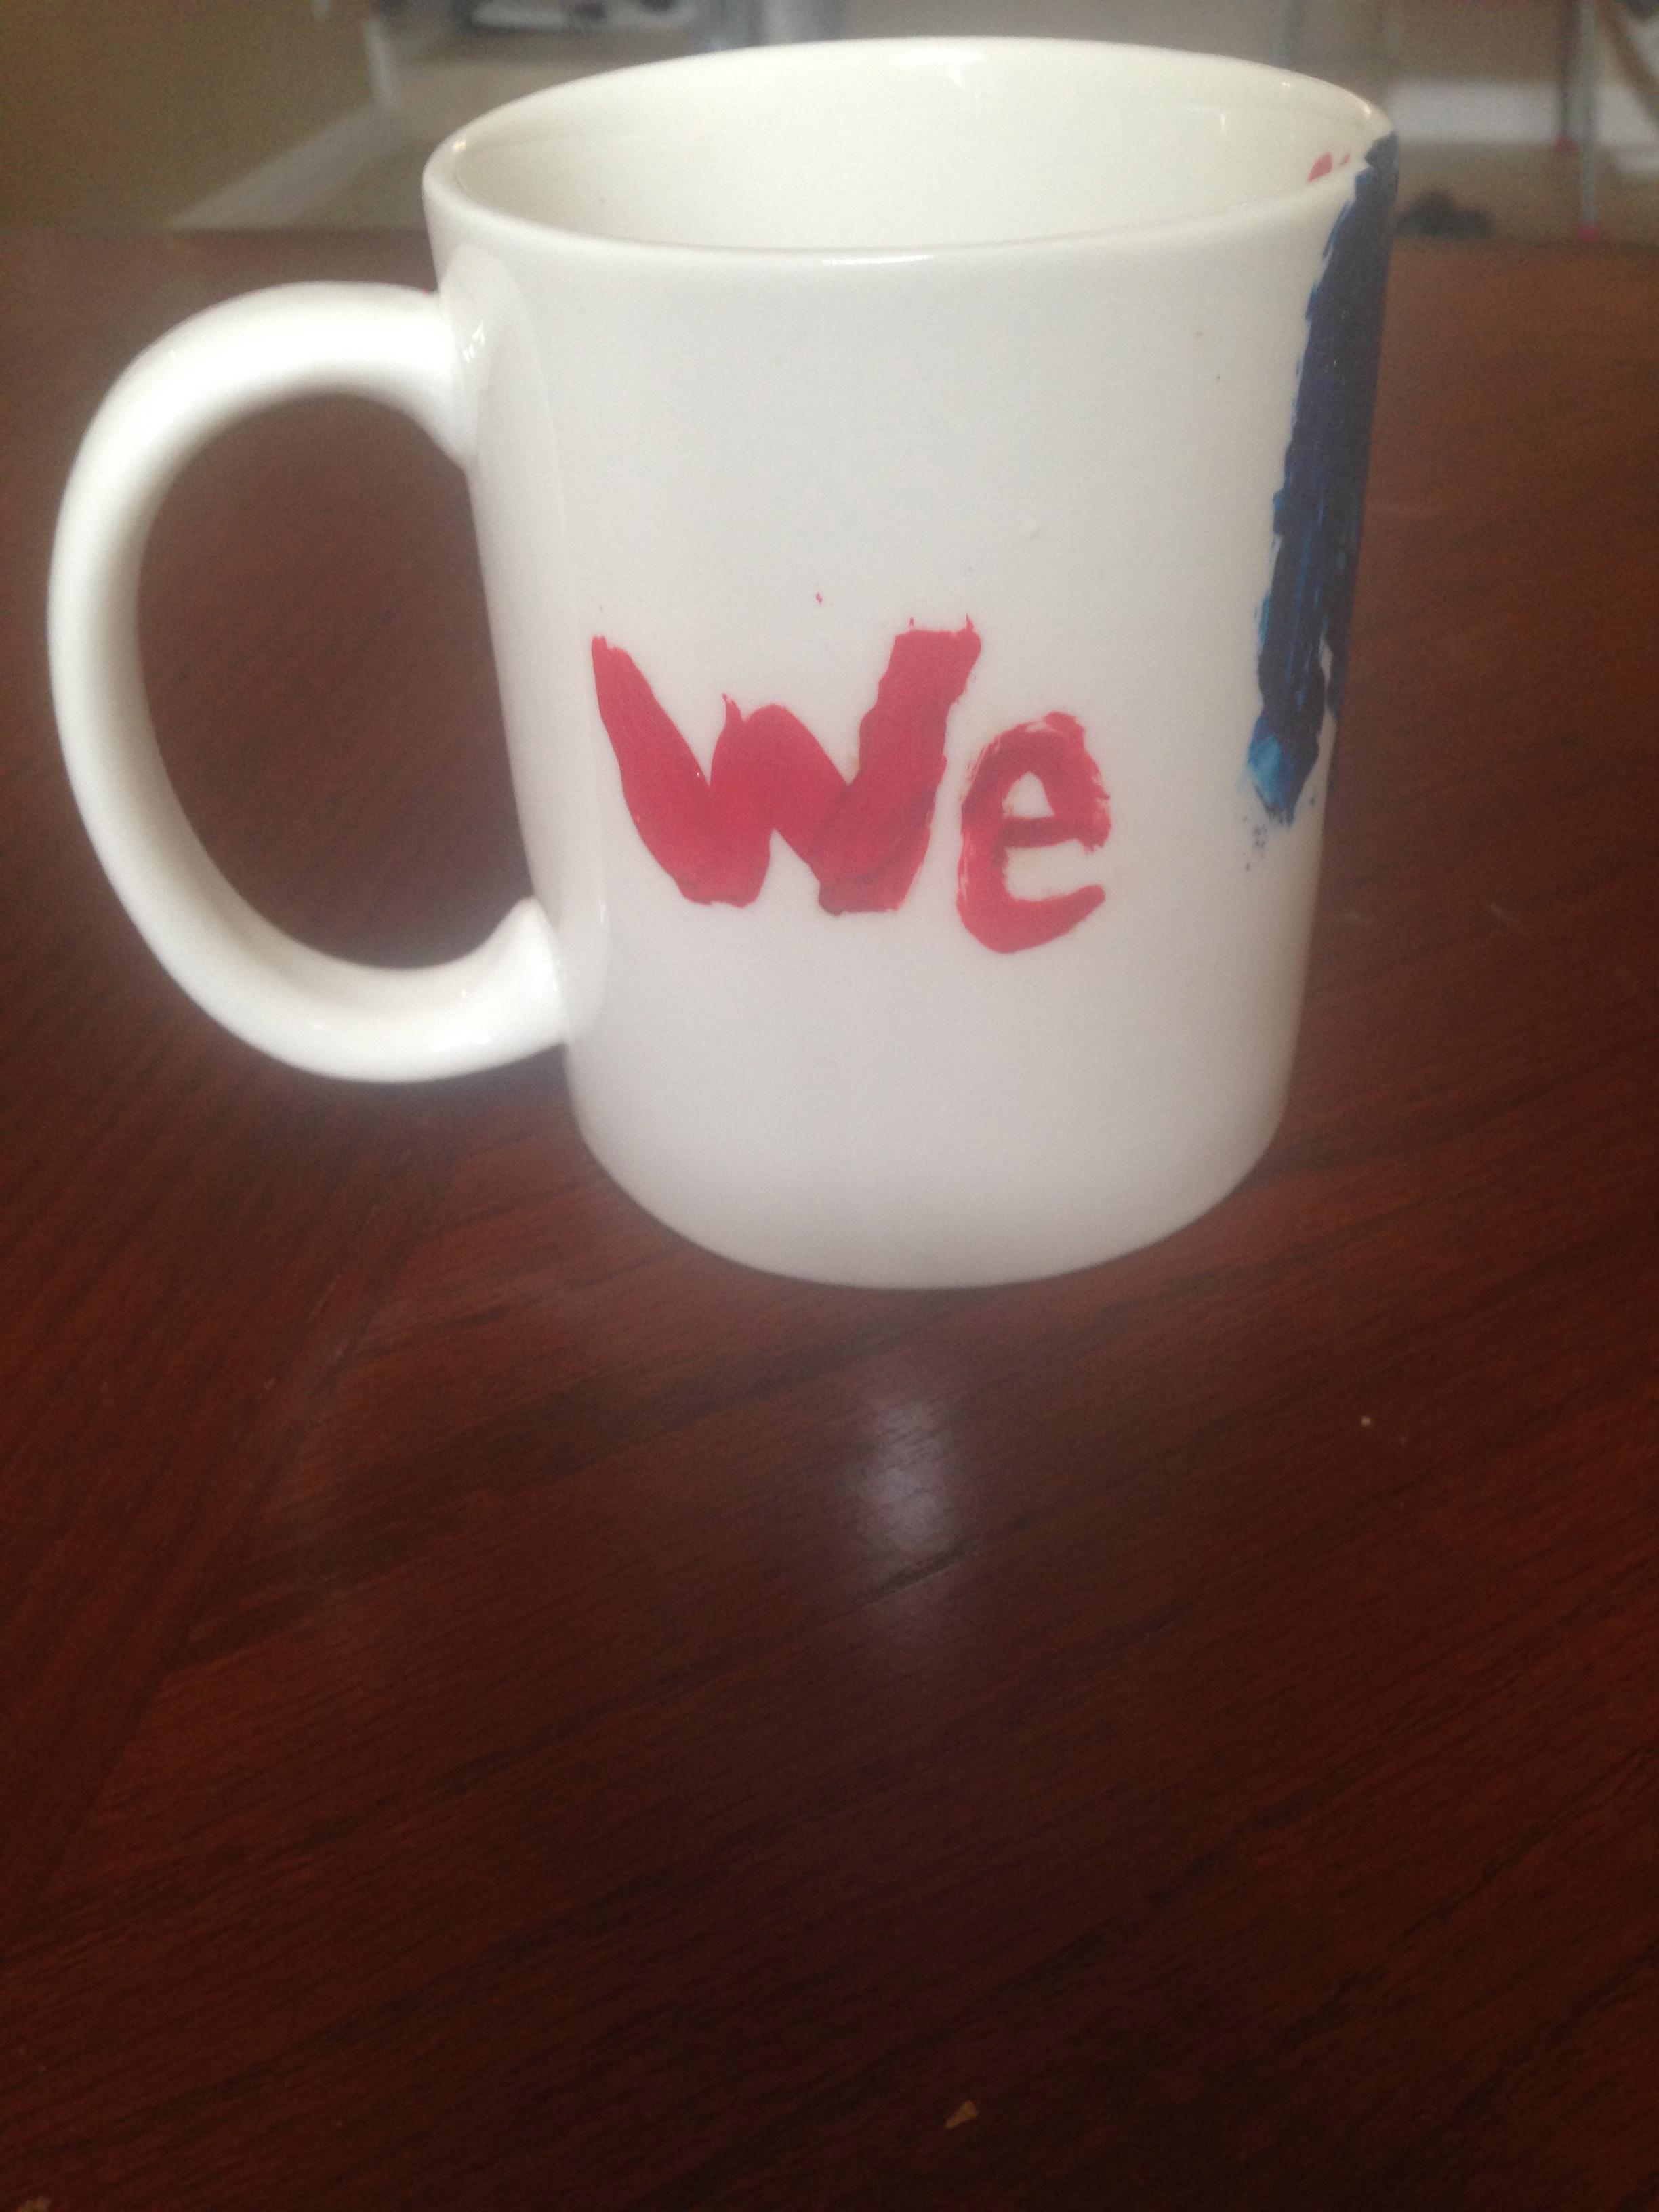 Cheap Mother-in-law Birthday Gift | Blogging Away Debt